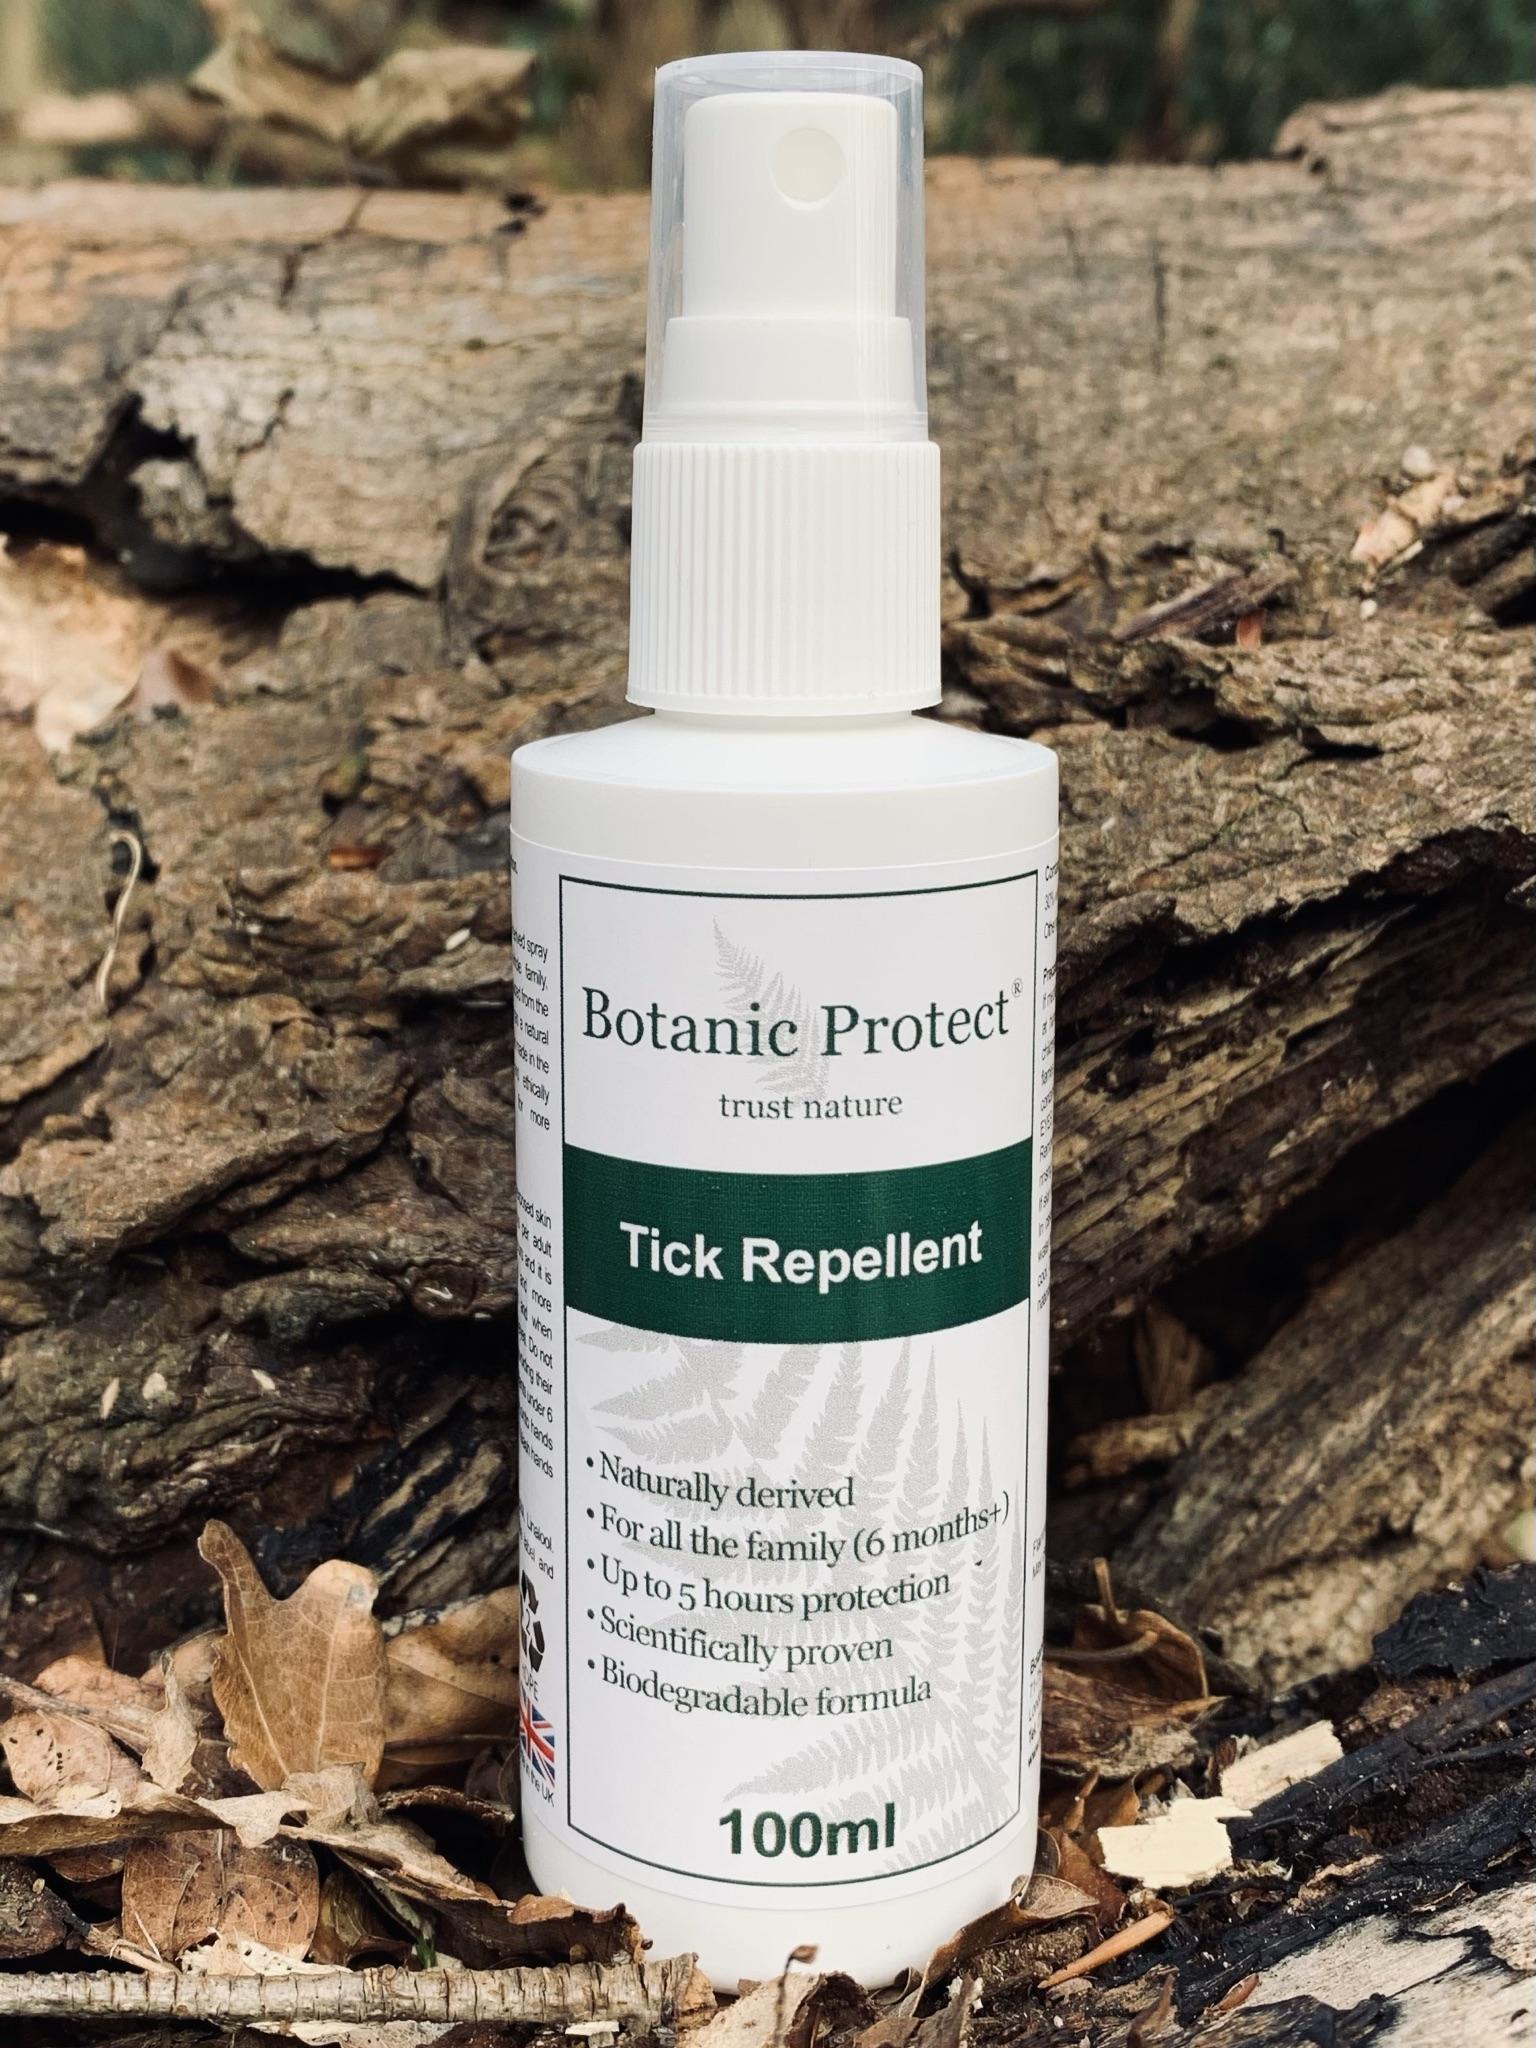 Bottle of Botanic Protect tick repellent